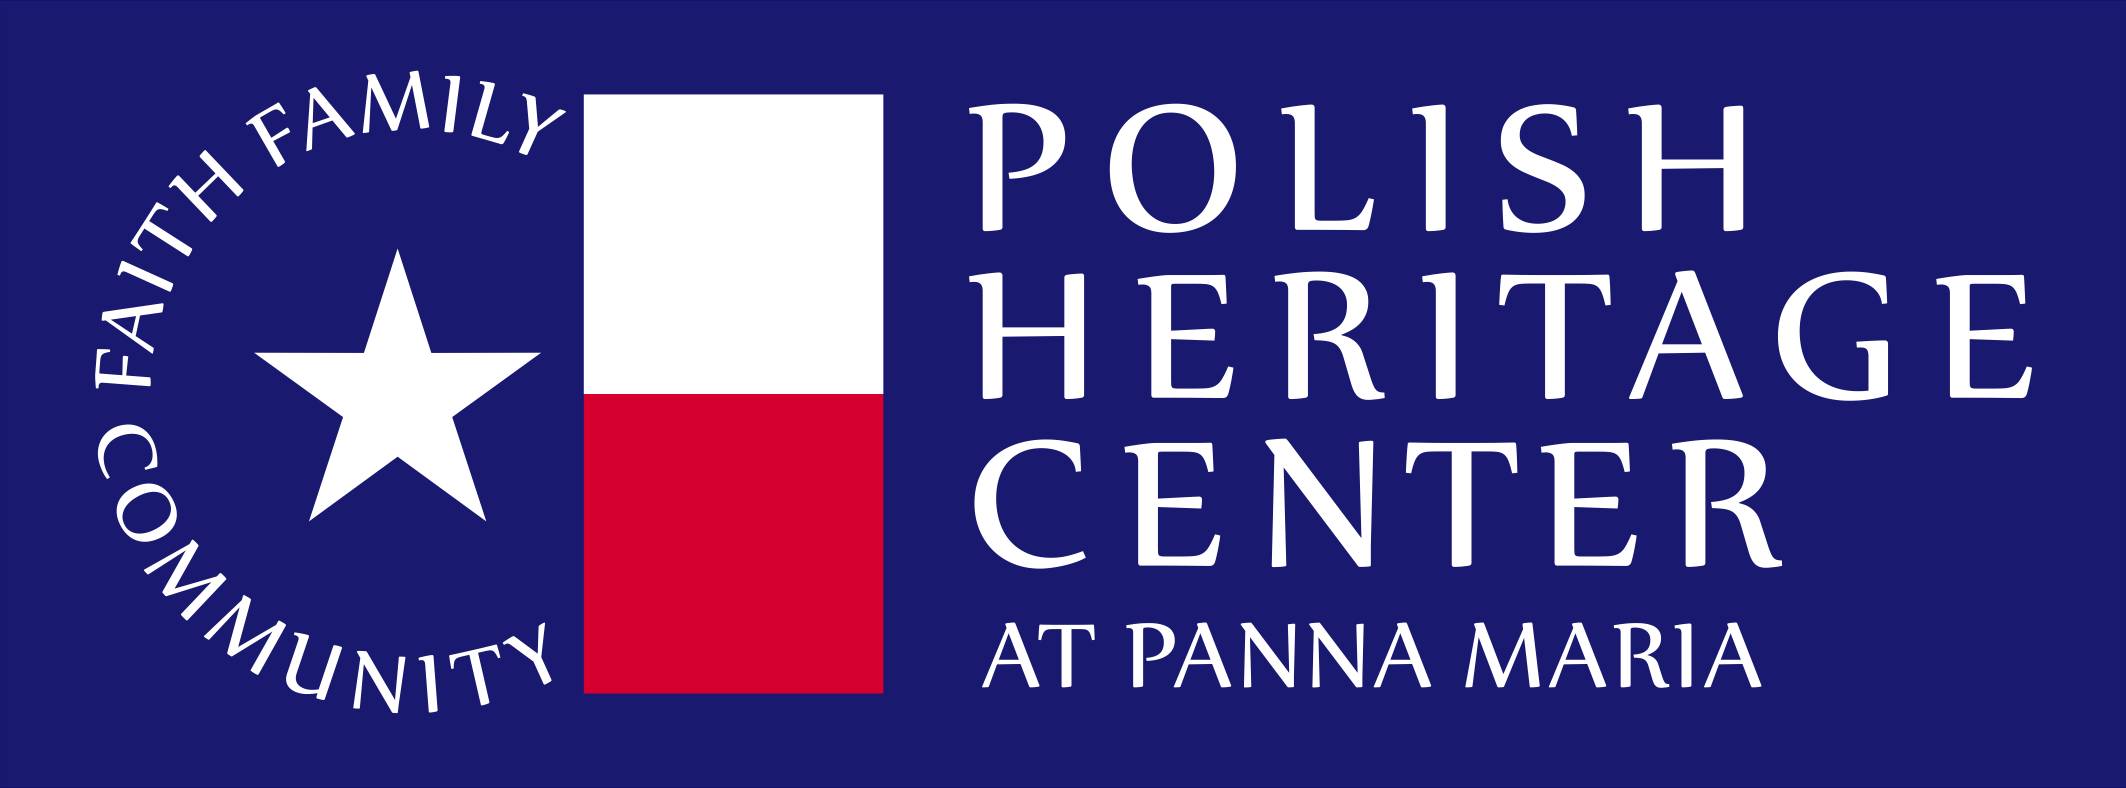 Polish Heritage Center - Panna Maria Texas - Logo creations invited!